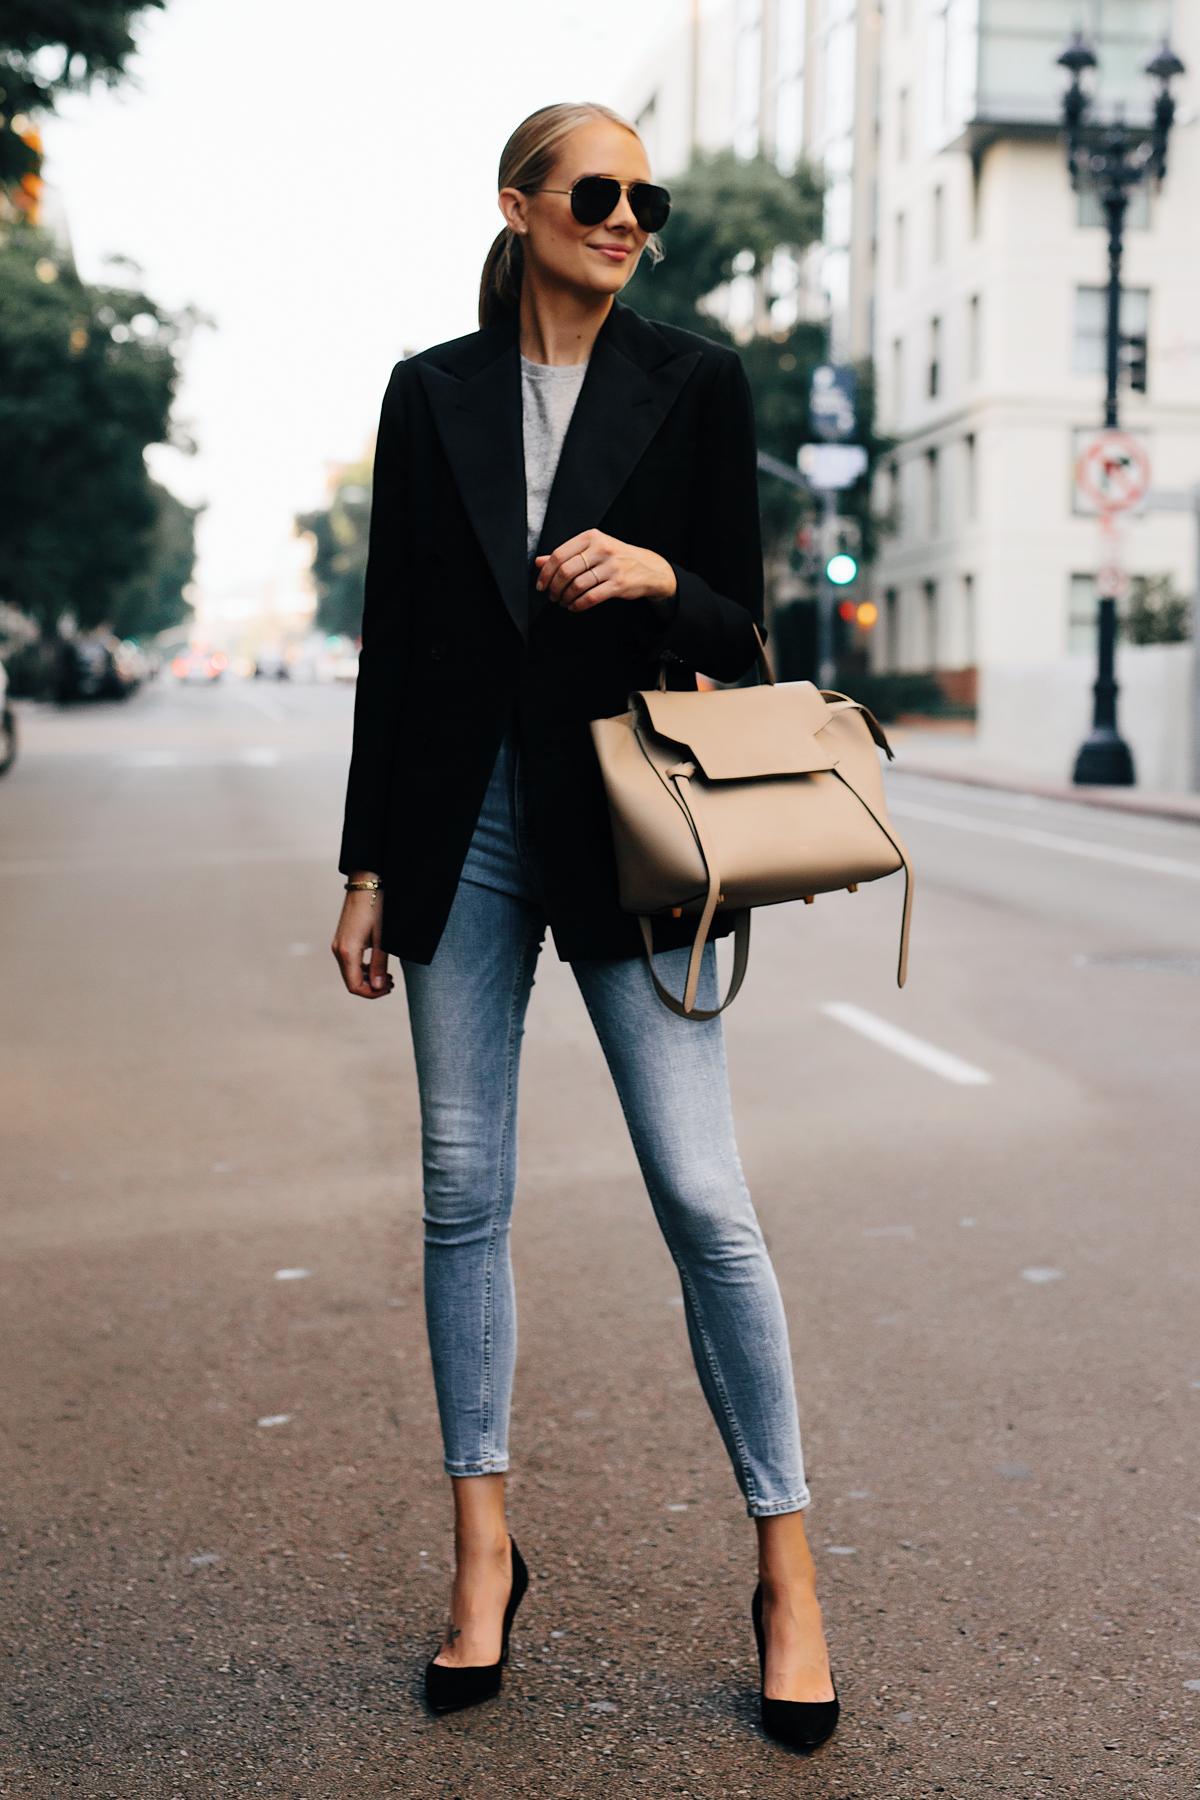 Blonde Woman Wearing Ralph Lauren Polo Black Blazer Grey Tshirt Denim Skinny Jeans Black Heels Outfit Celine Mini Belt Bag Fashion Jackson San Diego Fashion Blogger Street Style